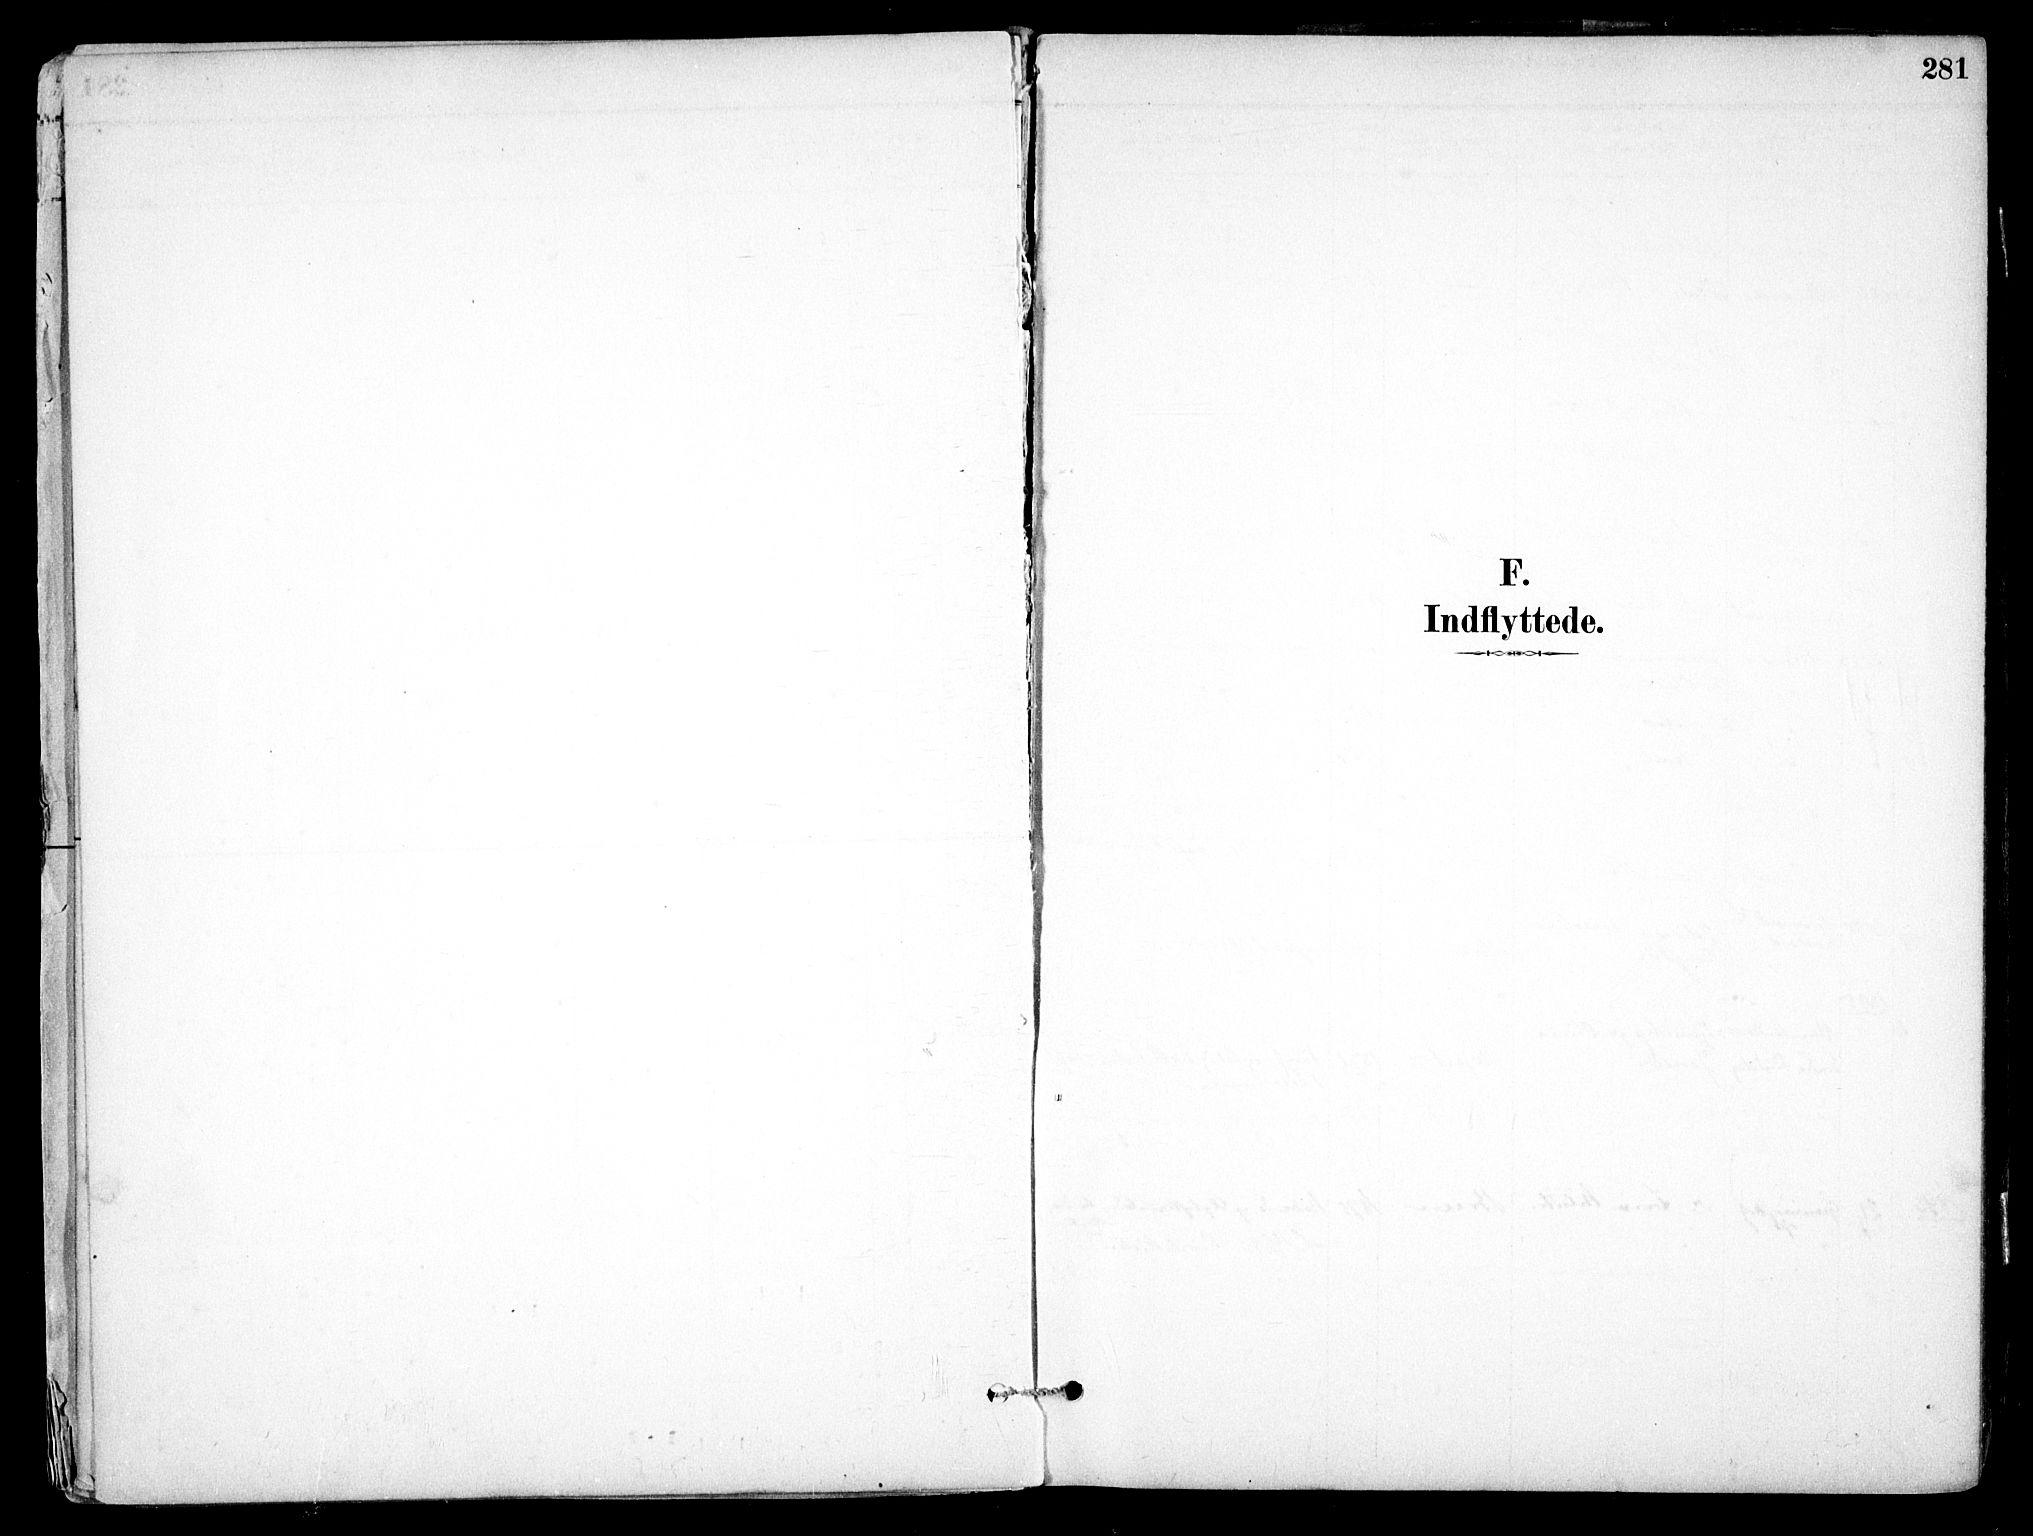 SAO, Nes prestekontor Kirkebøker, F/Fb/L0002: Ministerialbok nr. II 2, 1883-1918, s. 281